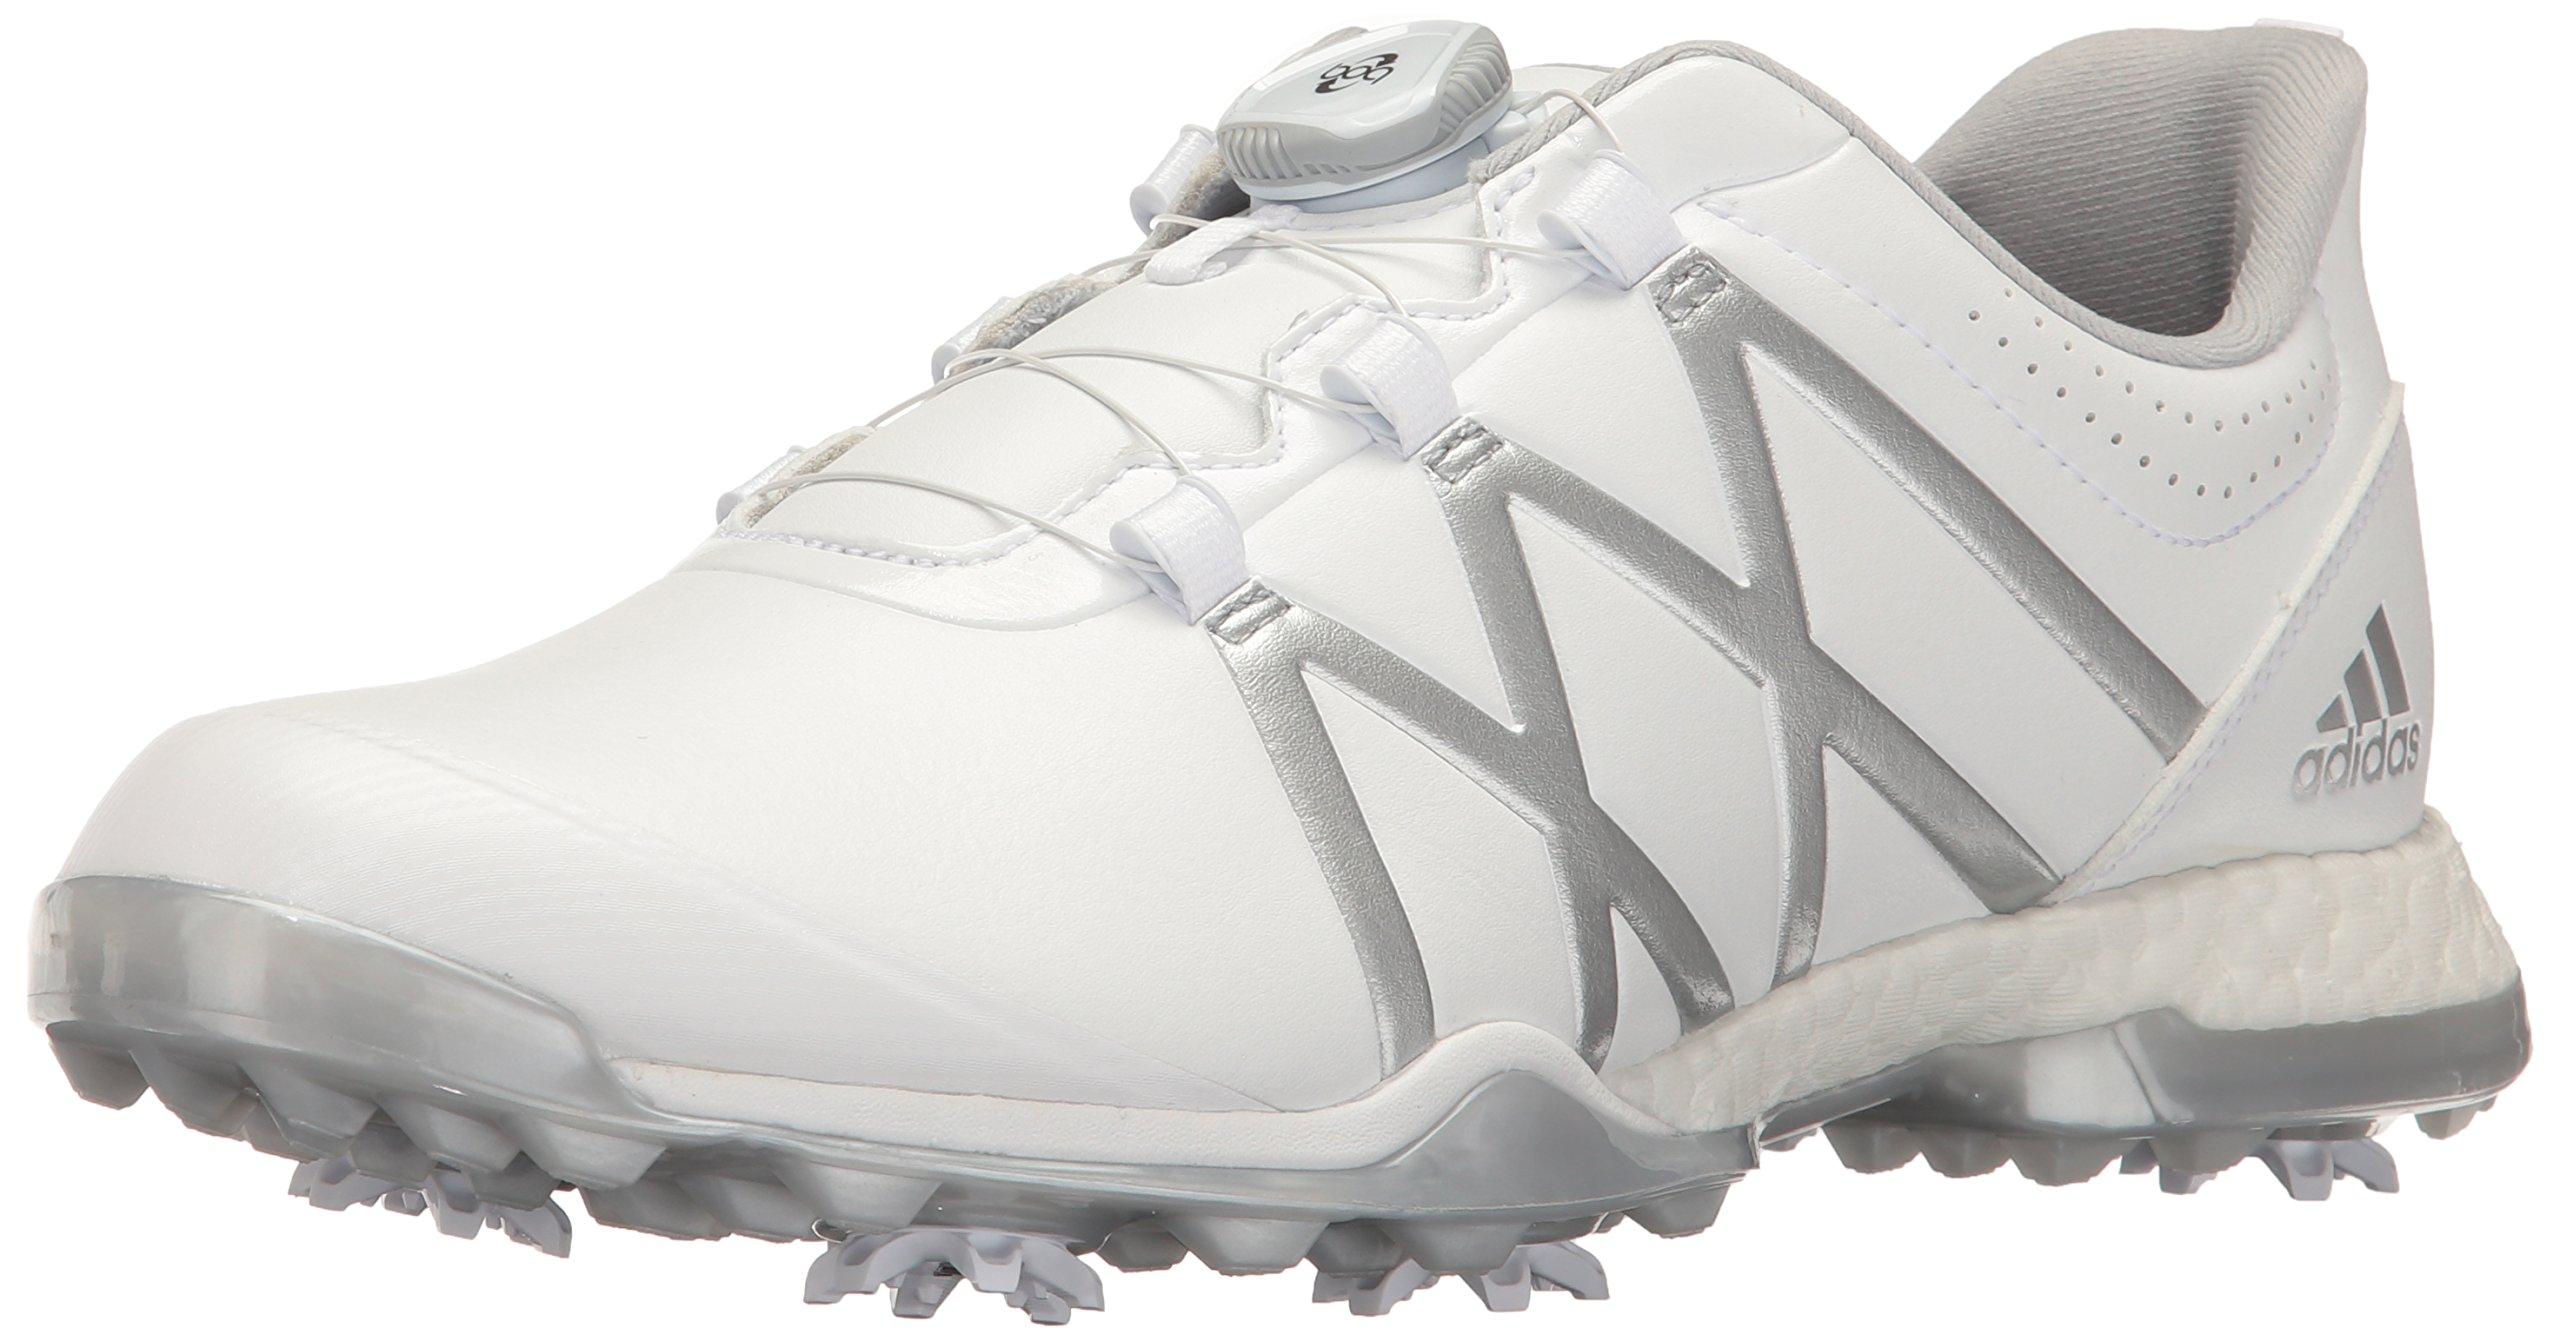 adidas Women's Adipower Boost BOA Golf Shoe, White/Matte Silver, 8 M US